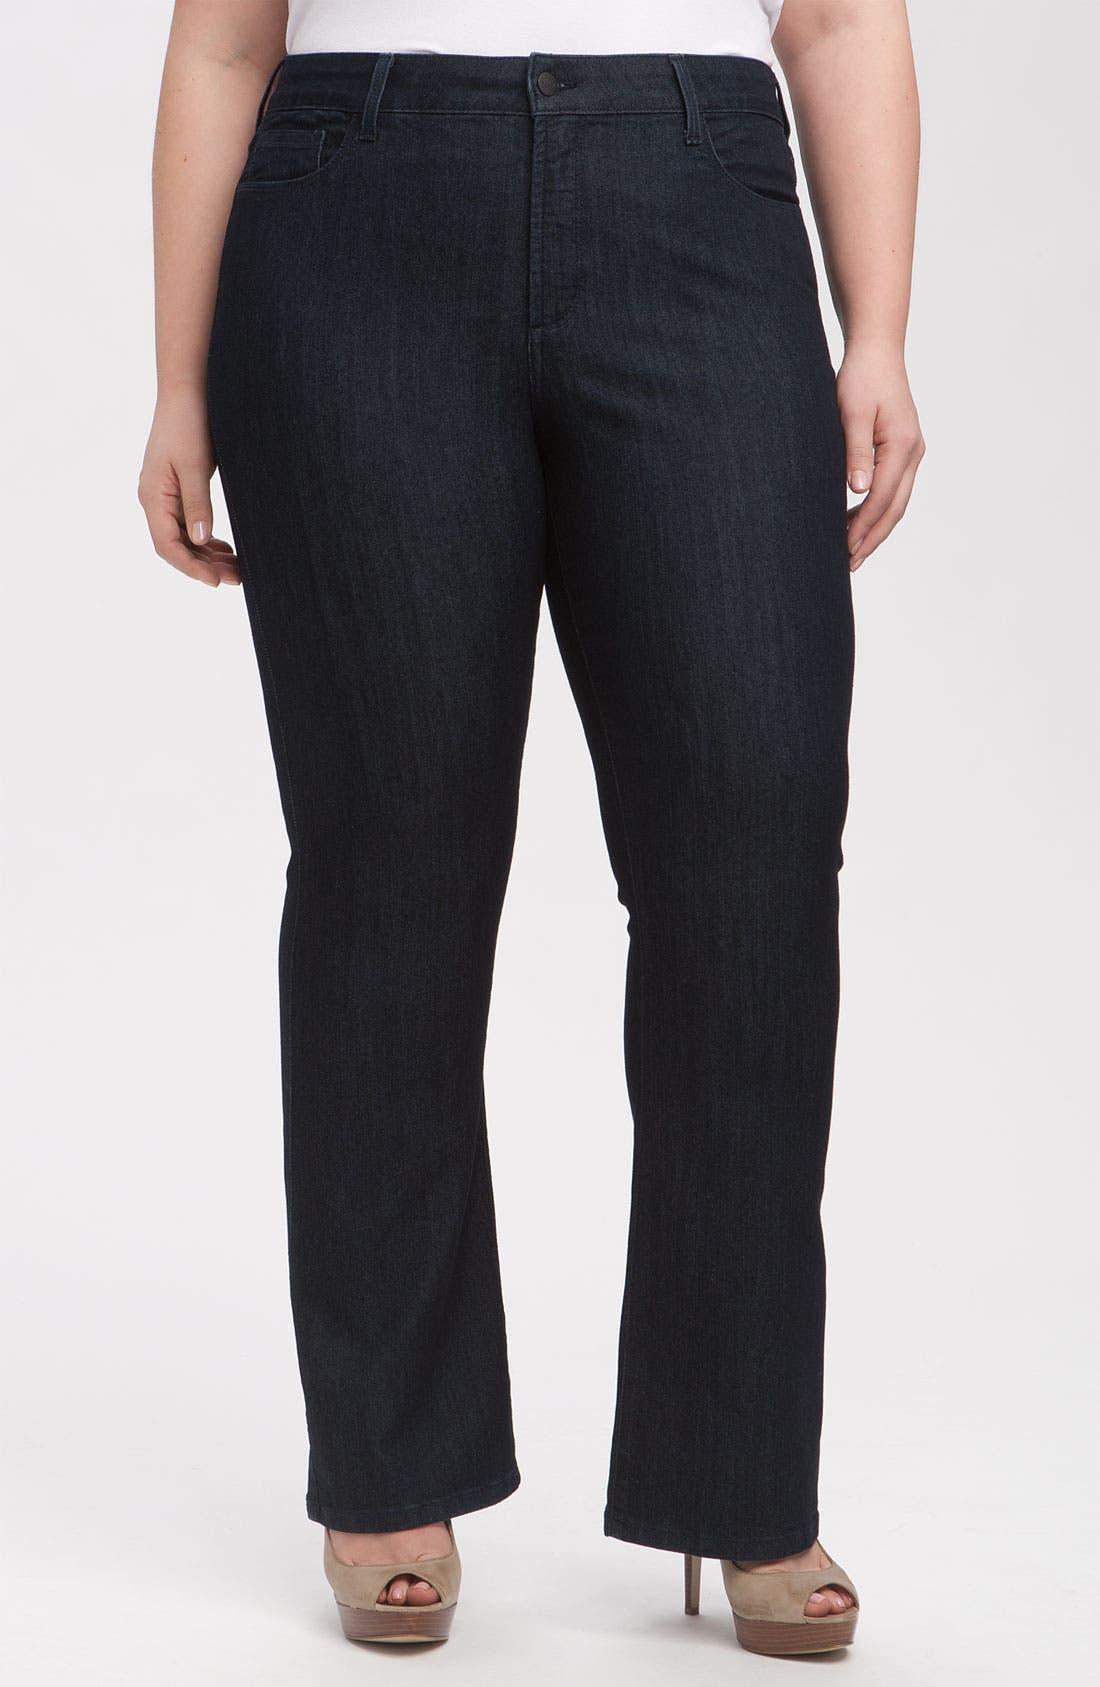 Main Image - NYDJ 'Barbara' Stretch Bootcut Jeans (Dark Enzyme) (Petite Plus Size)